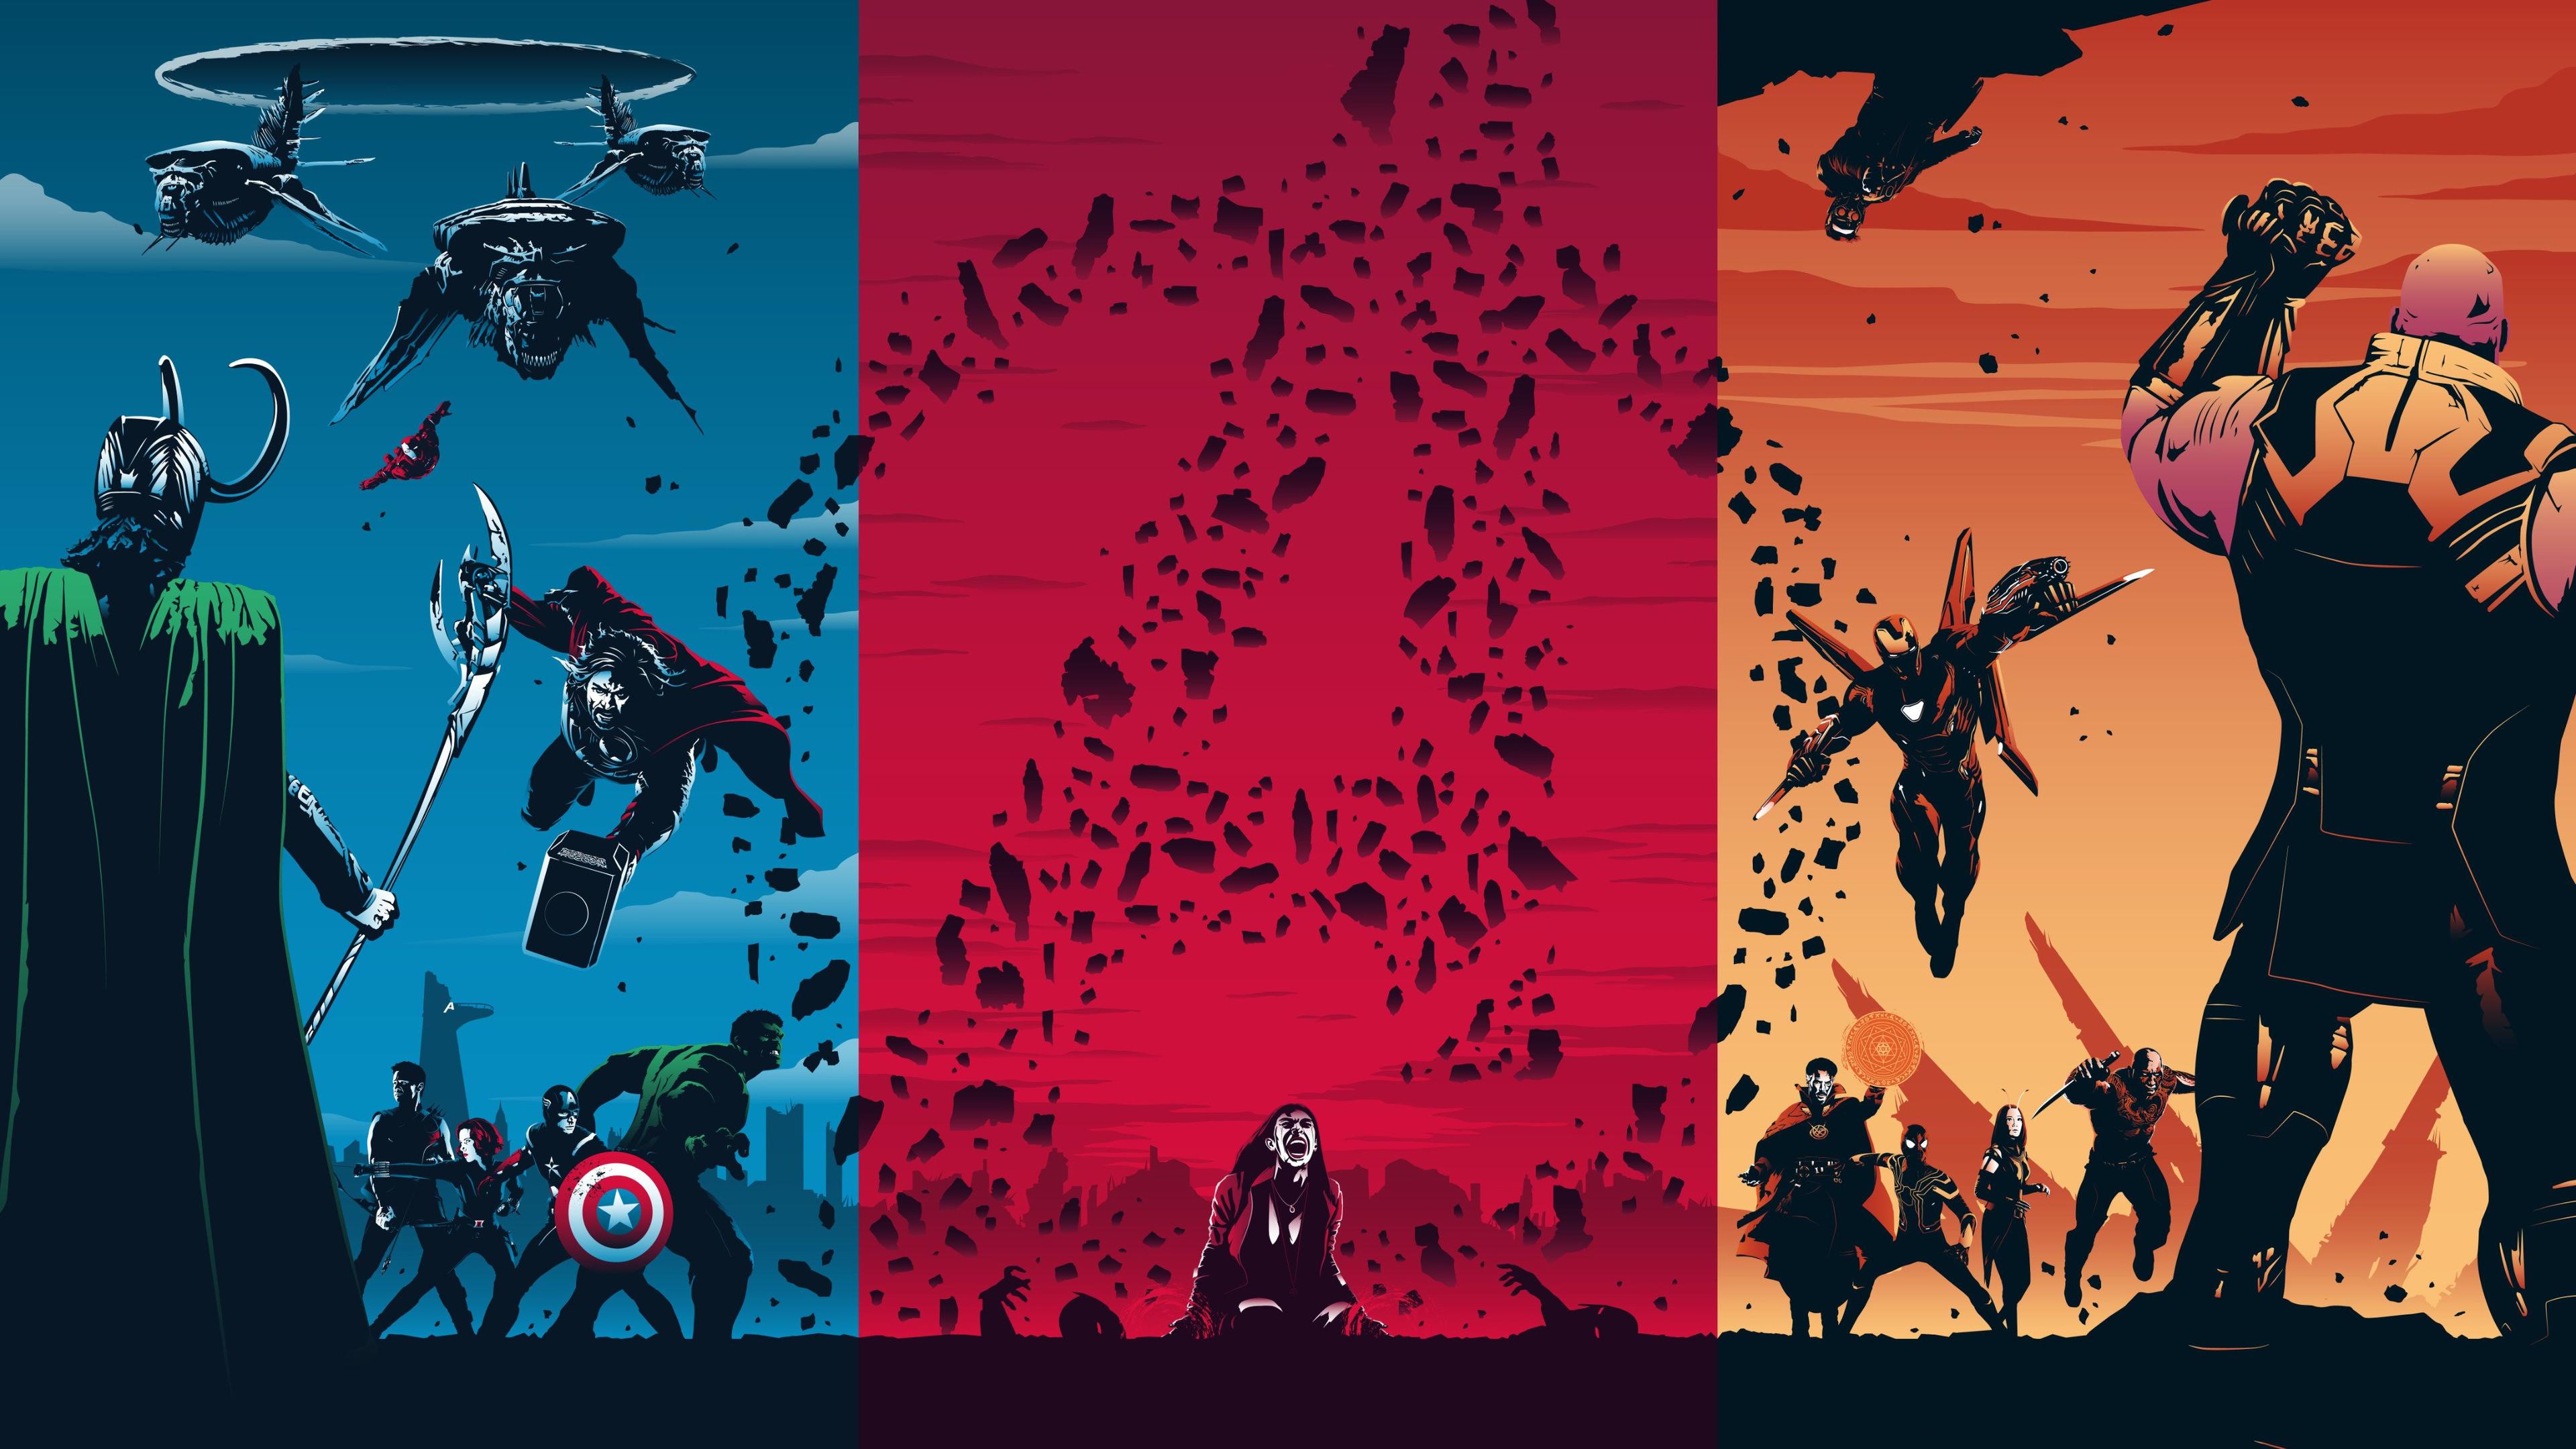 avengers trilogy 4k 1554244947 - Avengers Trilogy 4k - superheroes wallpapers, hd-wallpapers, digital art wallpapers, avengers-wallpapers, artwork wallpapers, 4k-wallpapers